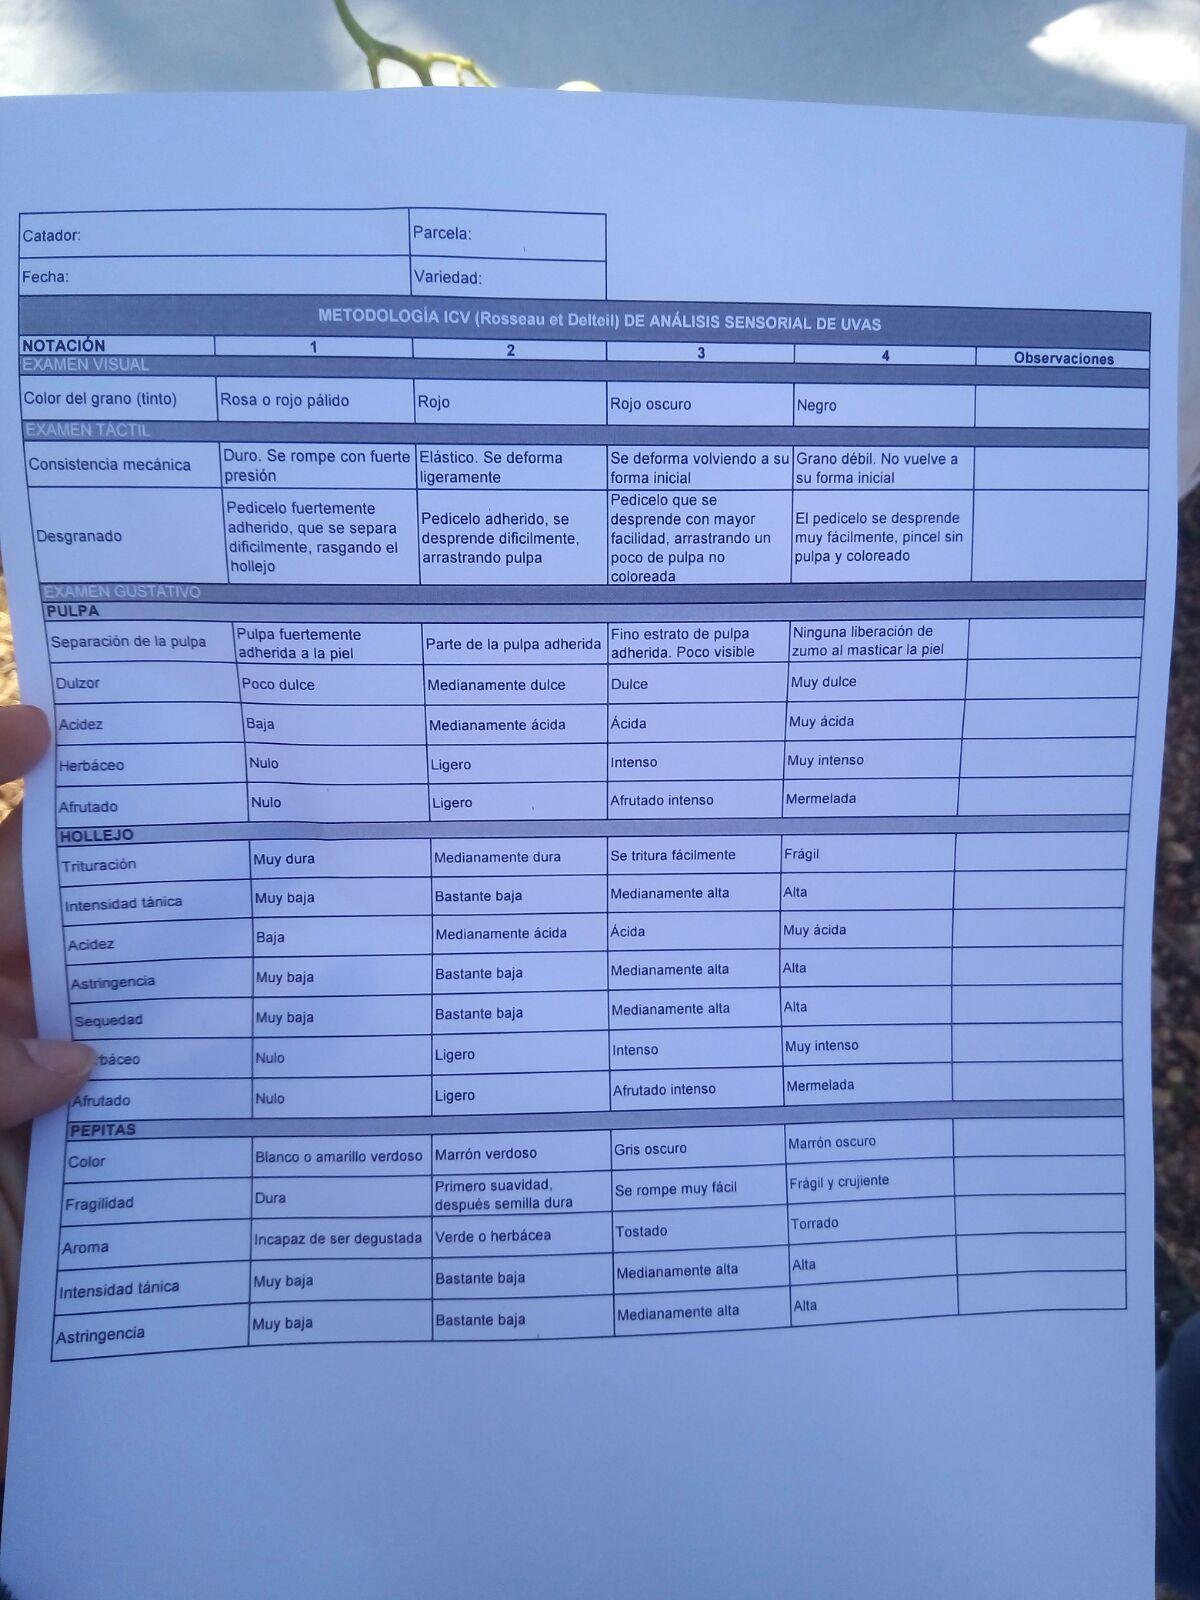 Ficha de protocolo de cata de uva